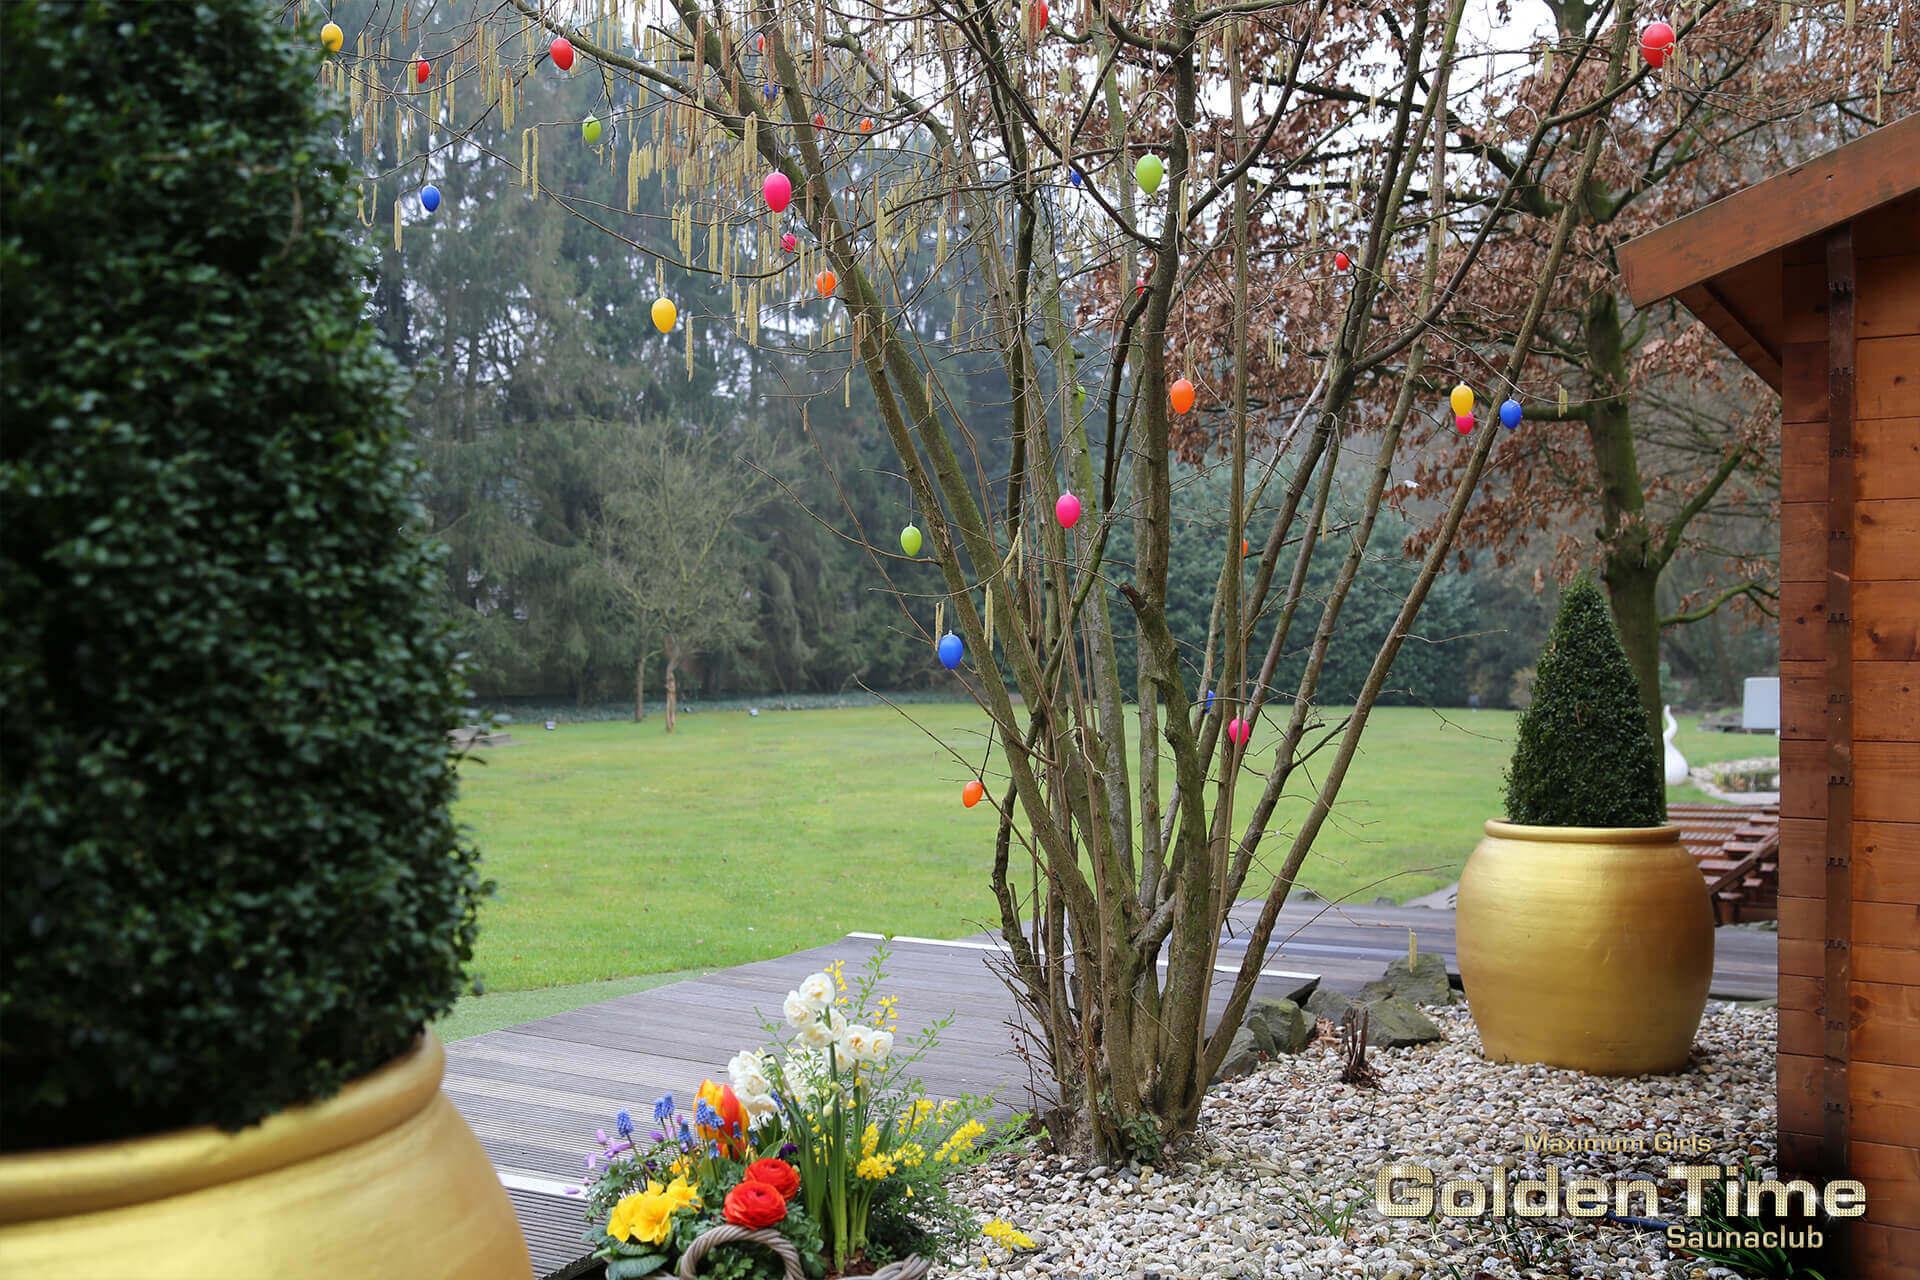 02-ostern-2016-pic-05-goldentime-saunaclub.jpg